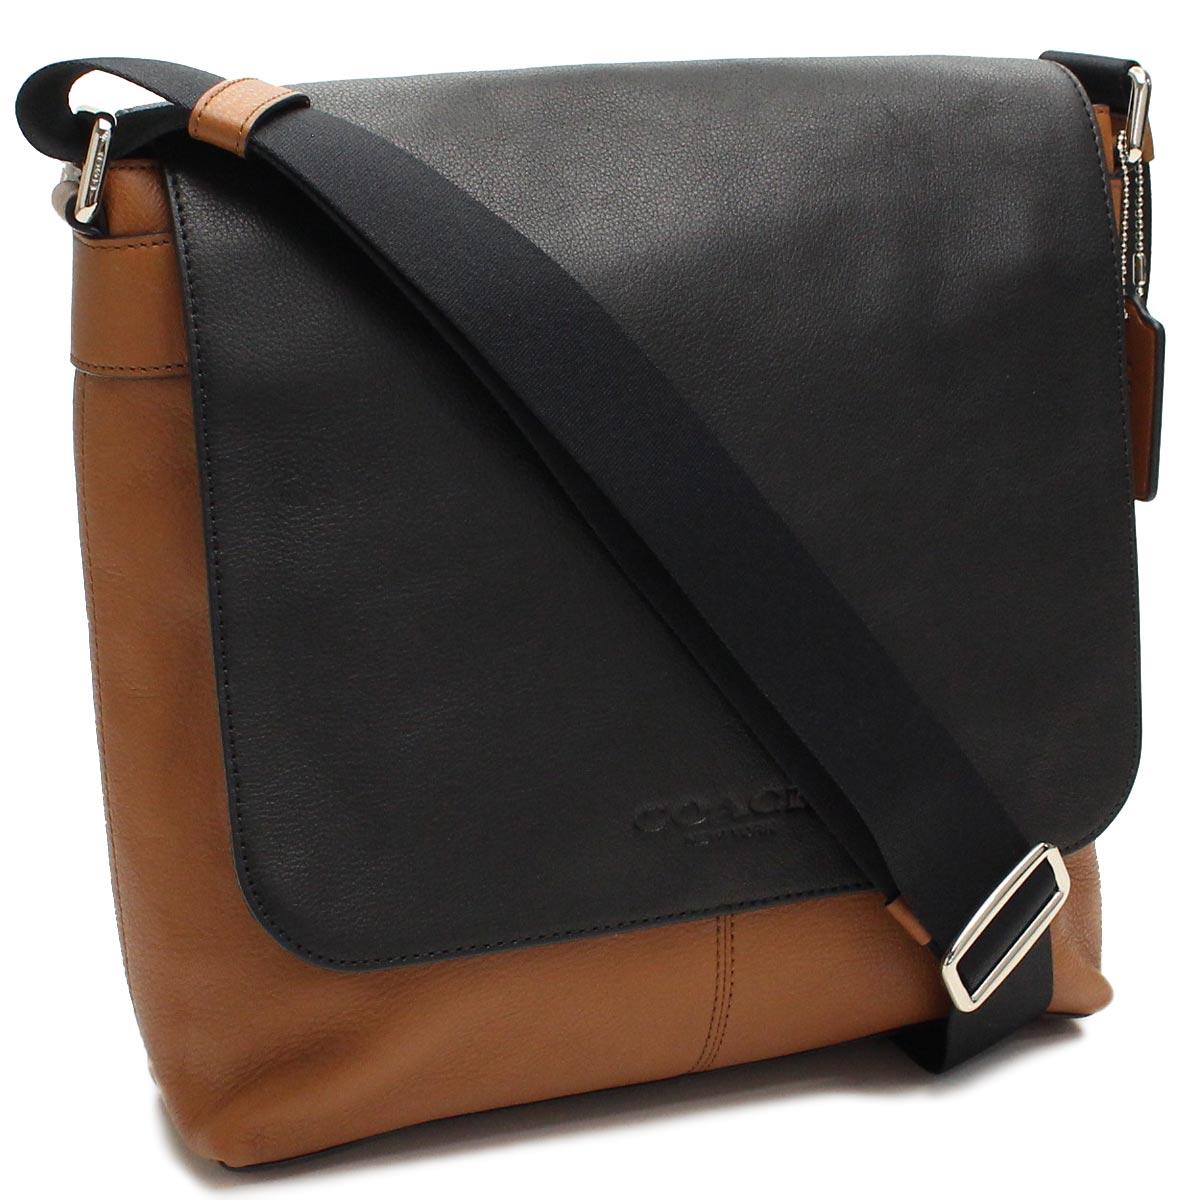 da94b8a60642 Bighit The total brand wholesale  Take coach (COACH) Sullivan slant  black  of shoulder bag F72108 BK SD Brown line